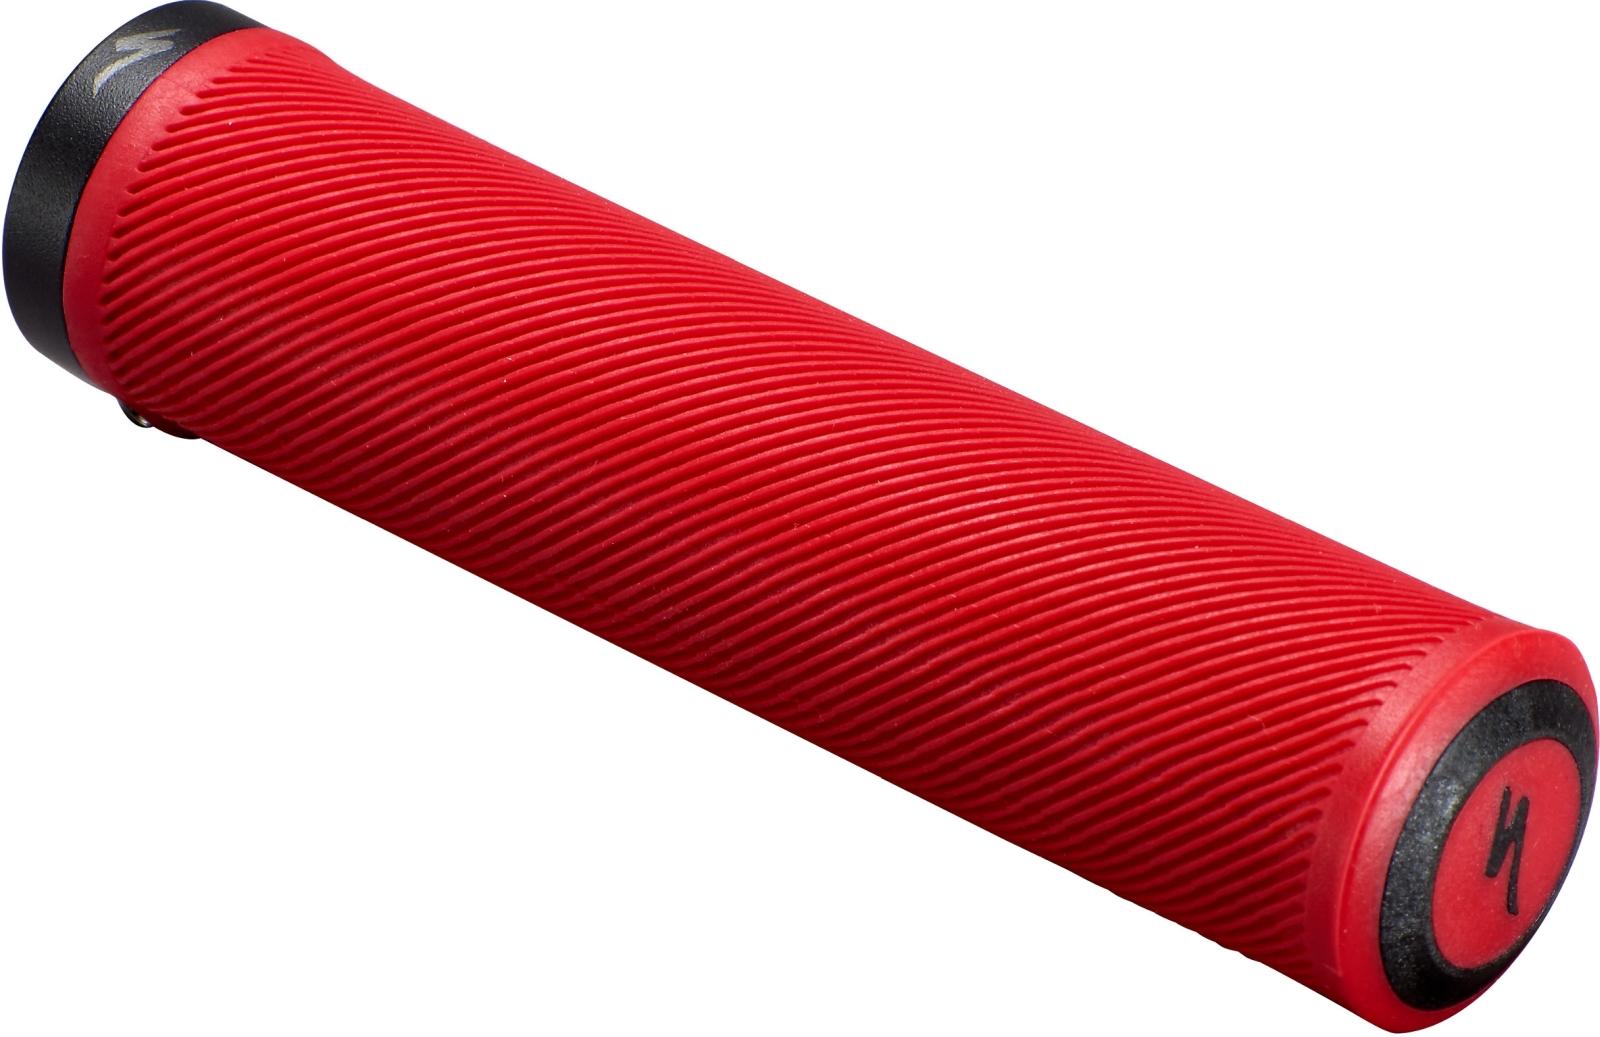 Specialized Trail grip L/XL - red uni